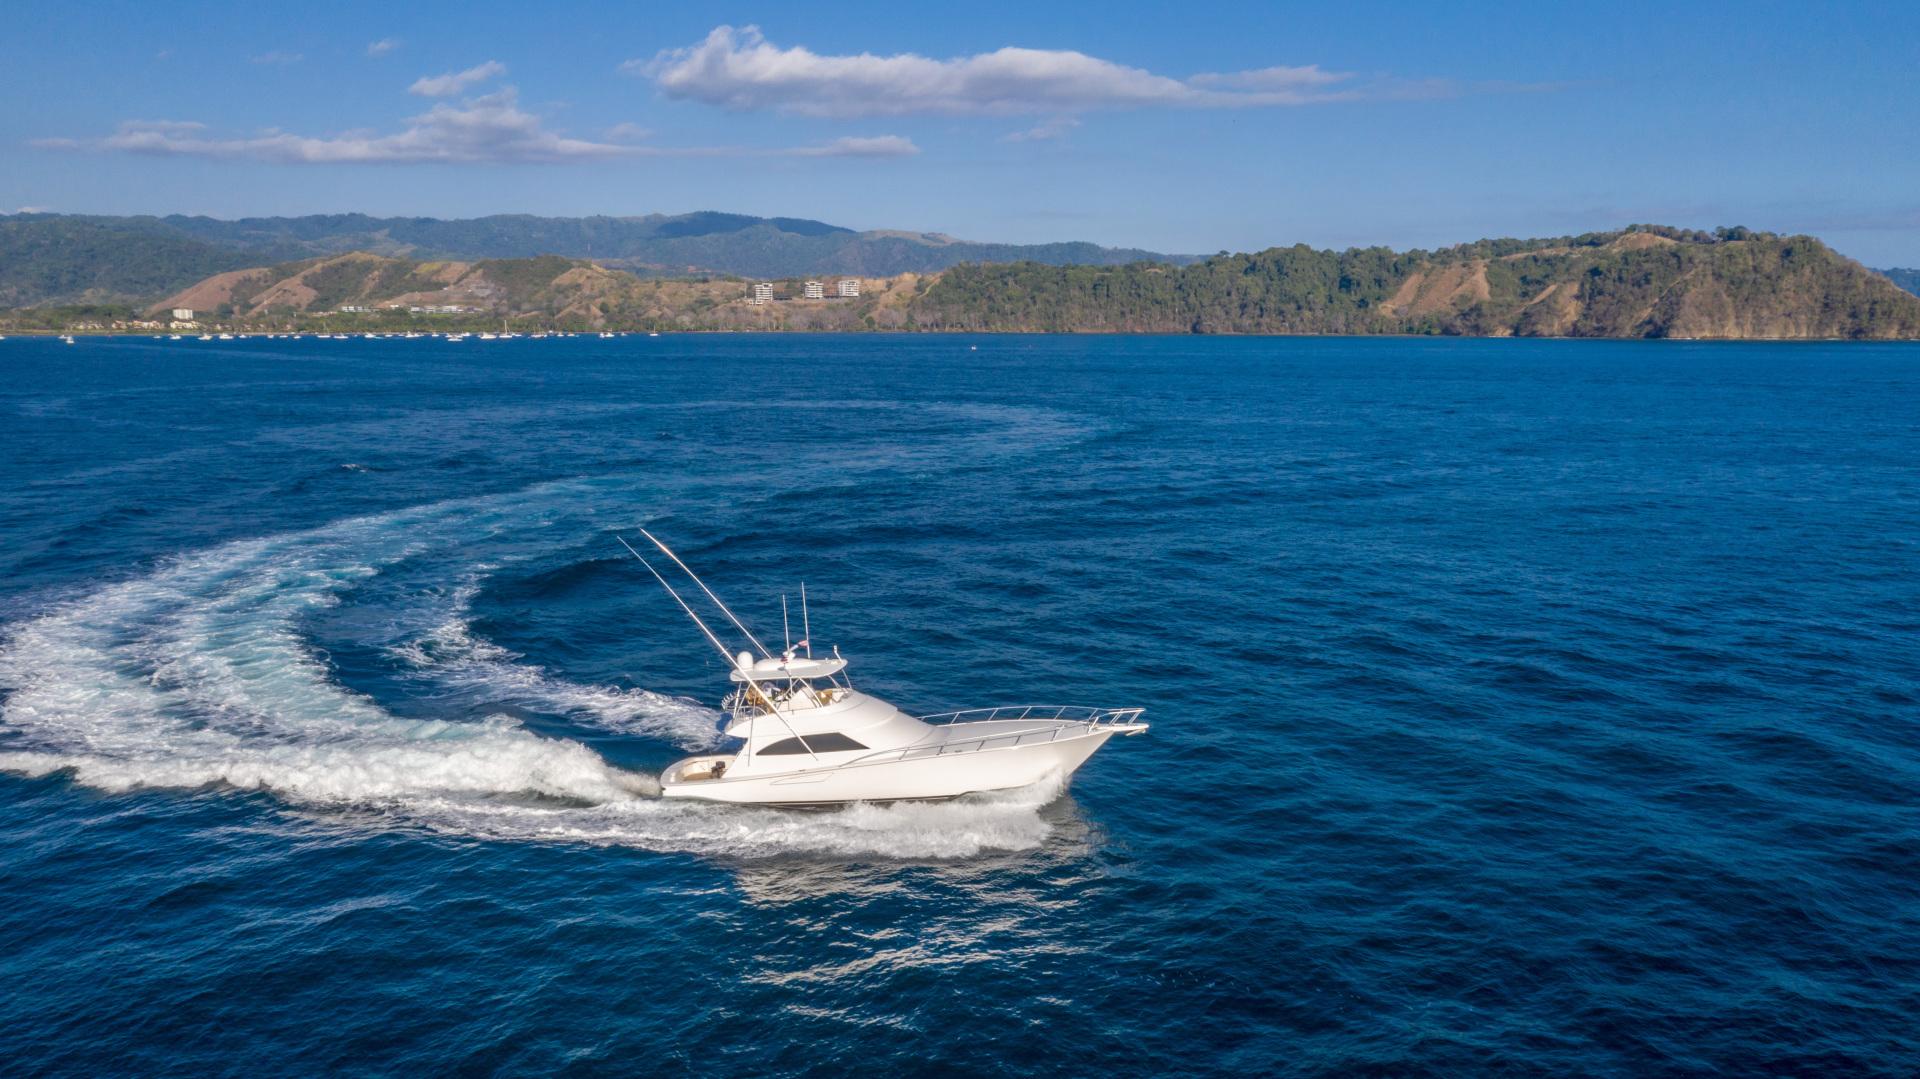 Viking-62 Convertible 2014-Mixer Playa Herradura, Los Suenos,-Costa Rica-2014 Viking 62 Convertible  Starboard Profile Running-1356283 | Thumbnail